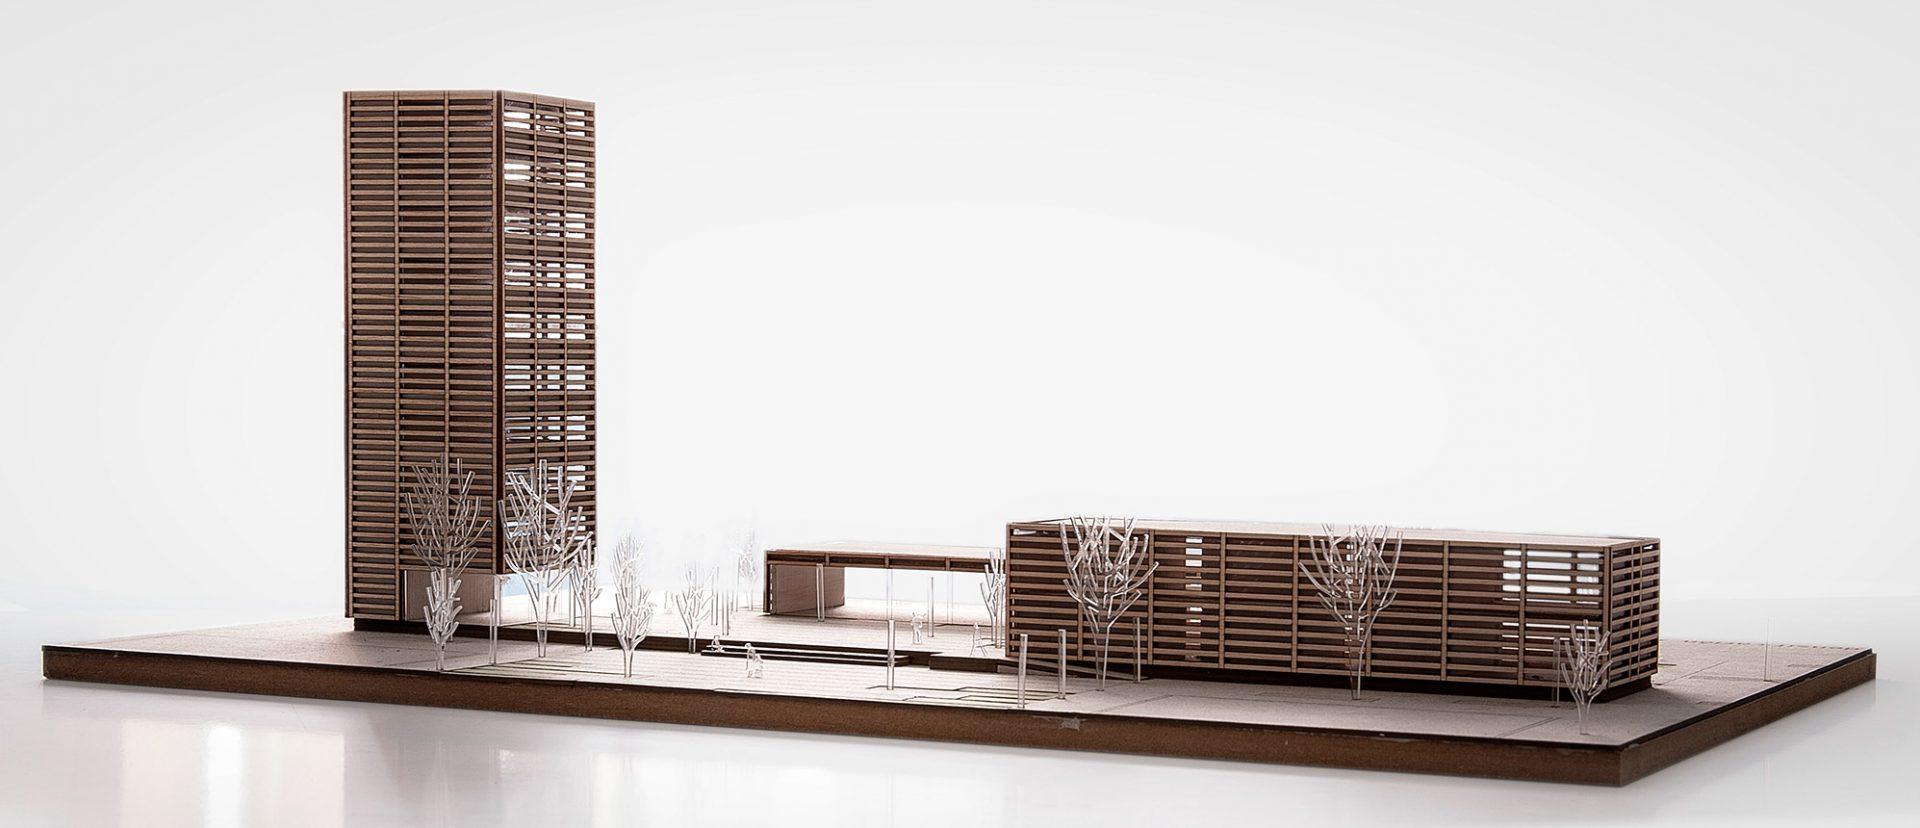 maqueta-arquitectura-valencia-pfc-tfg-UPV-huerta-grande-arquiayuda (1)